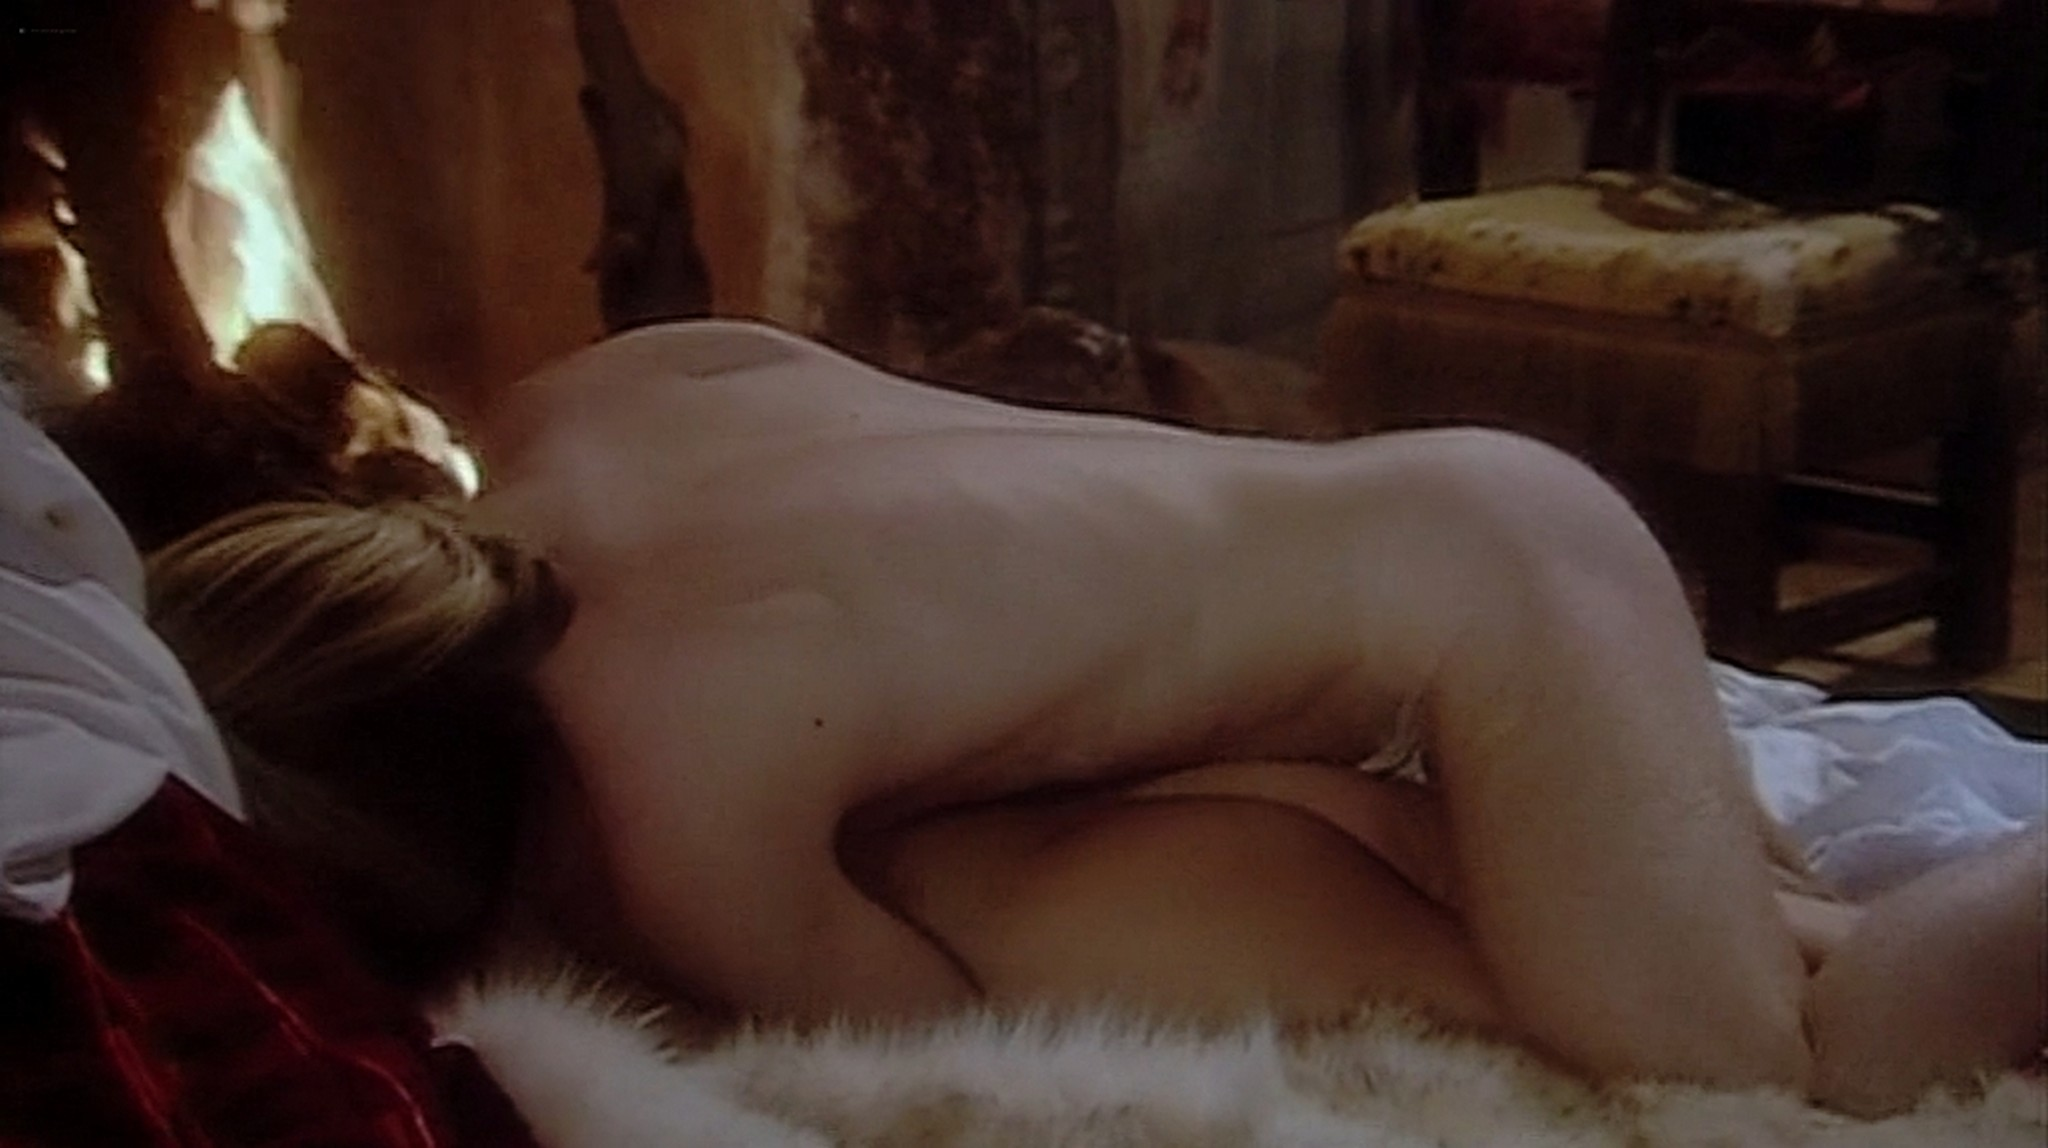 Laura Antonelli nude topless and sex Monica Guerritore nude topless and Clelia Rondinella nude lesbian sex La Venexiana 1986 DVDRip 13